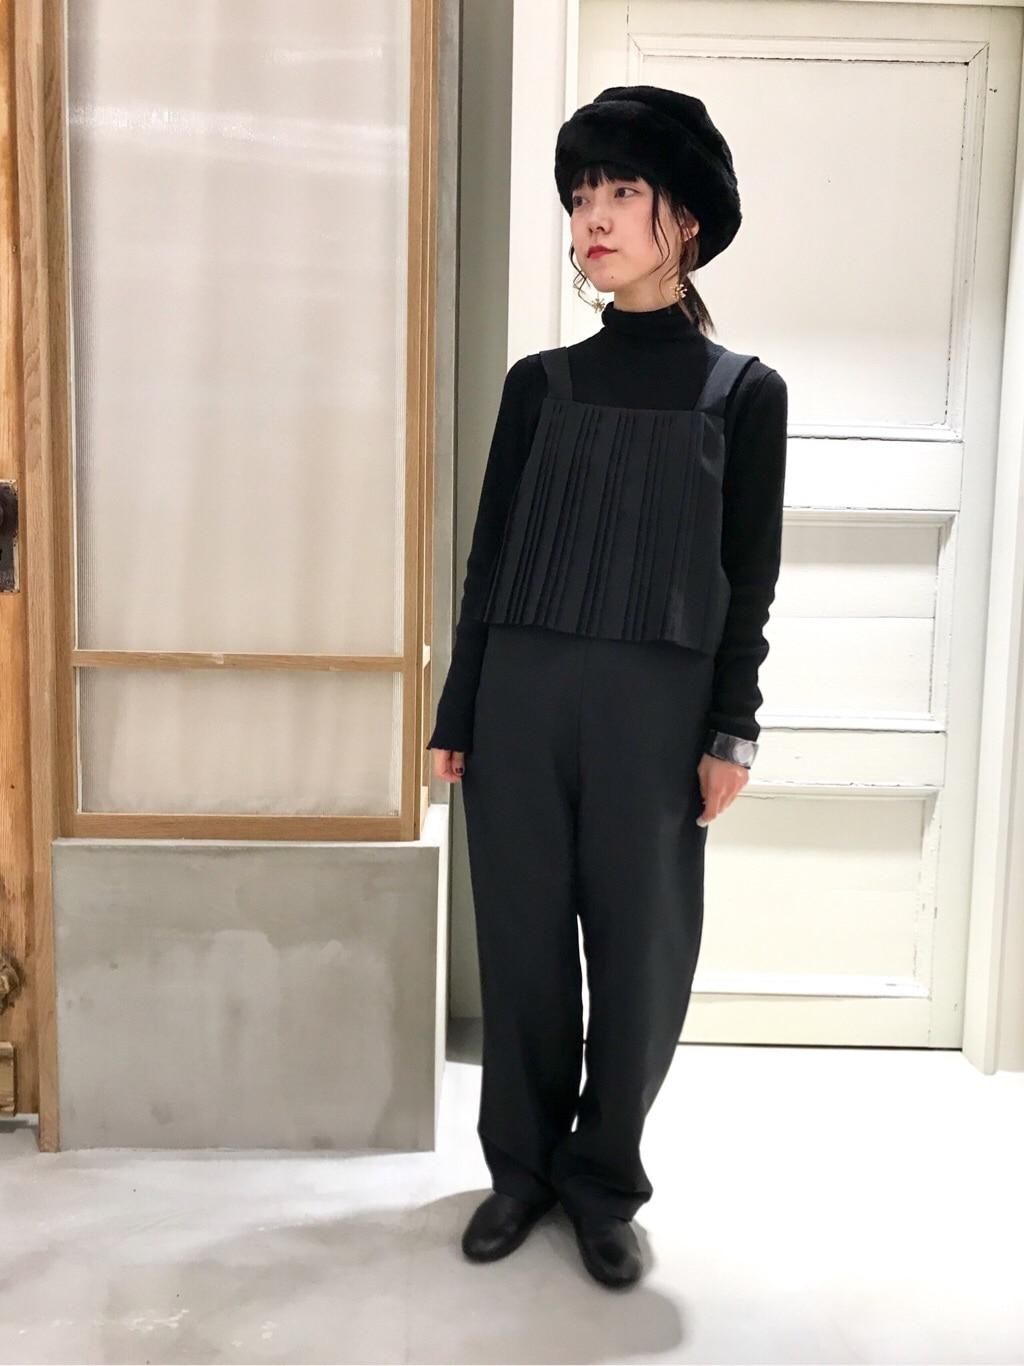 bulle de savon 渋谷スクランブルスクエア 身長:153cm 2019.12.04